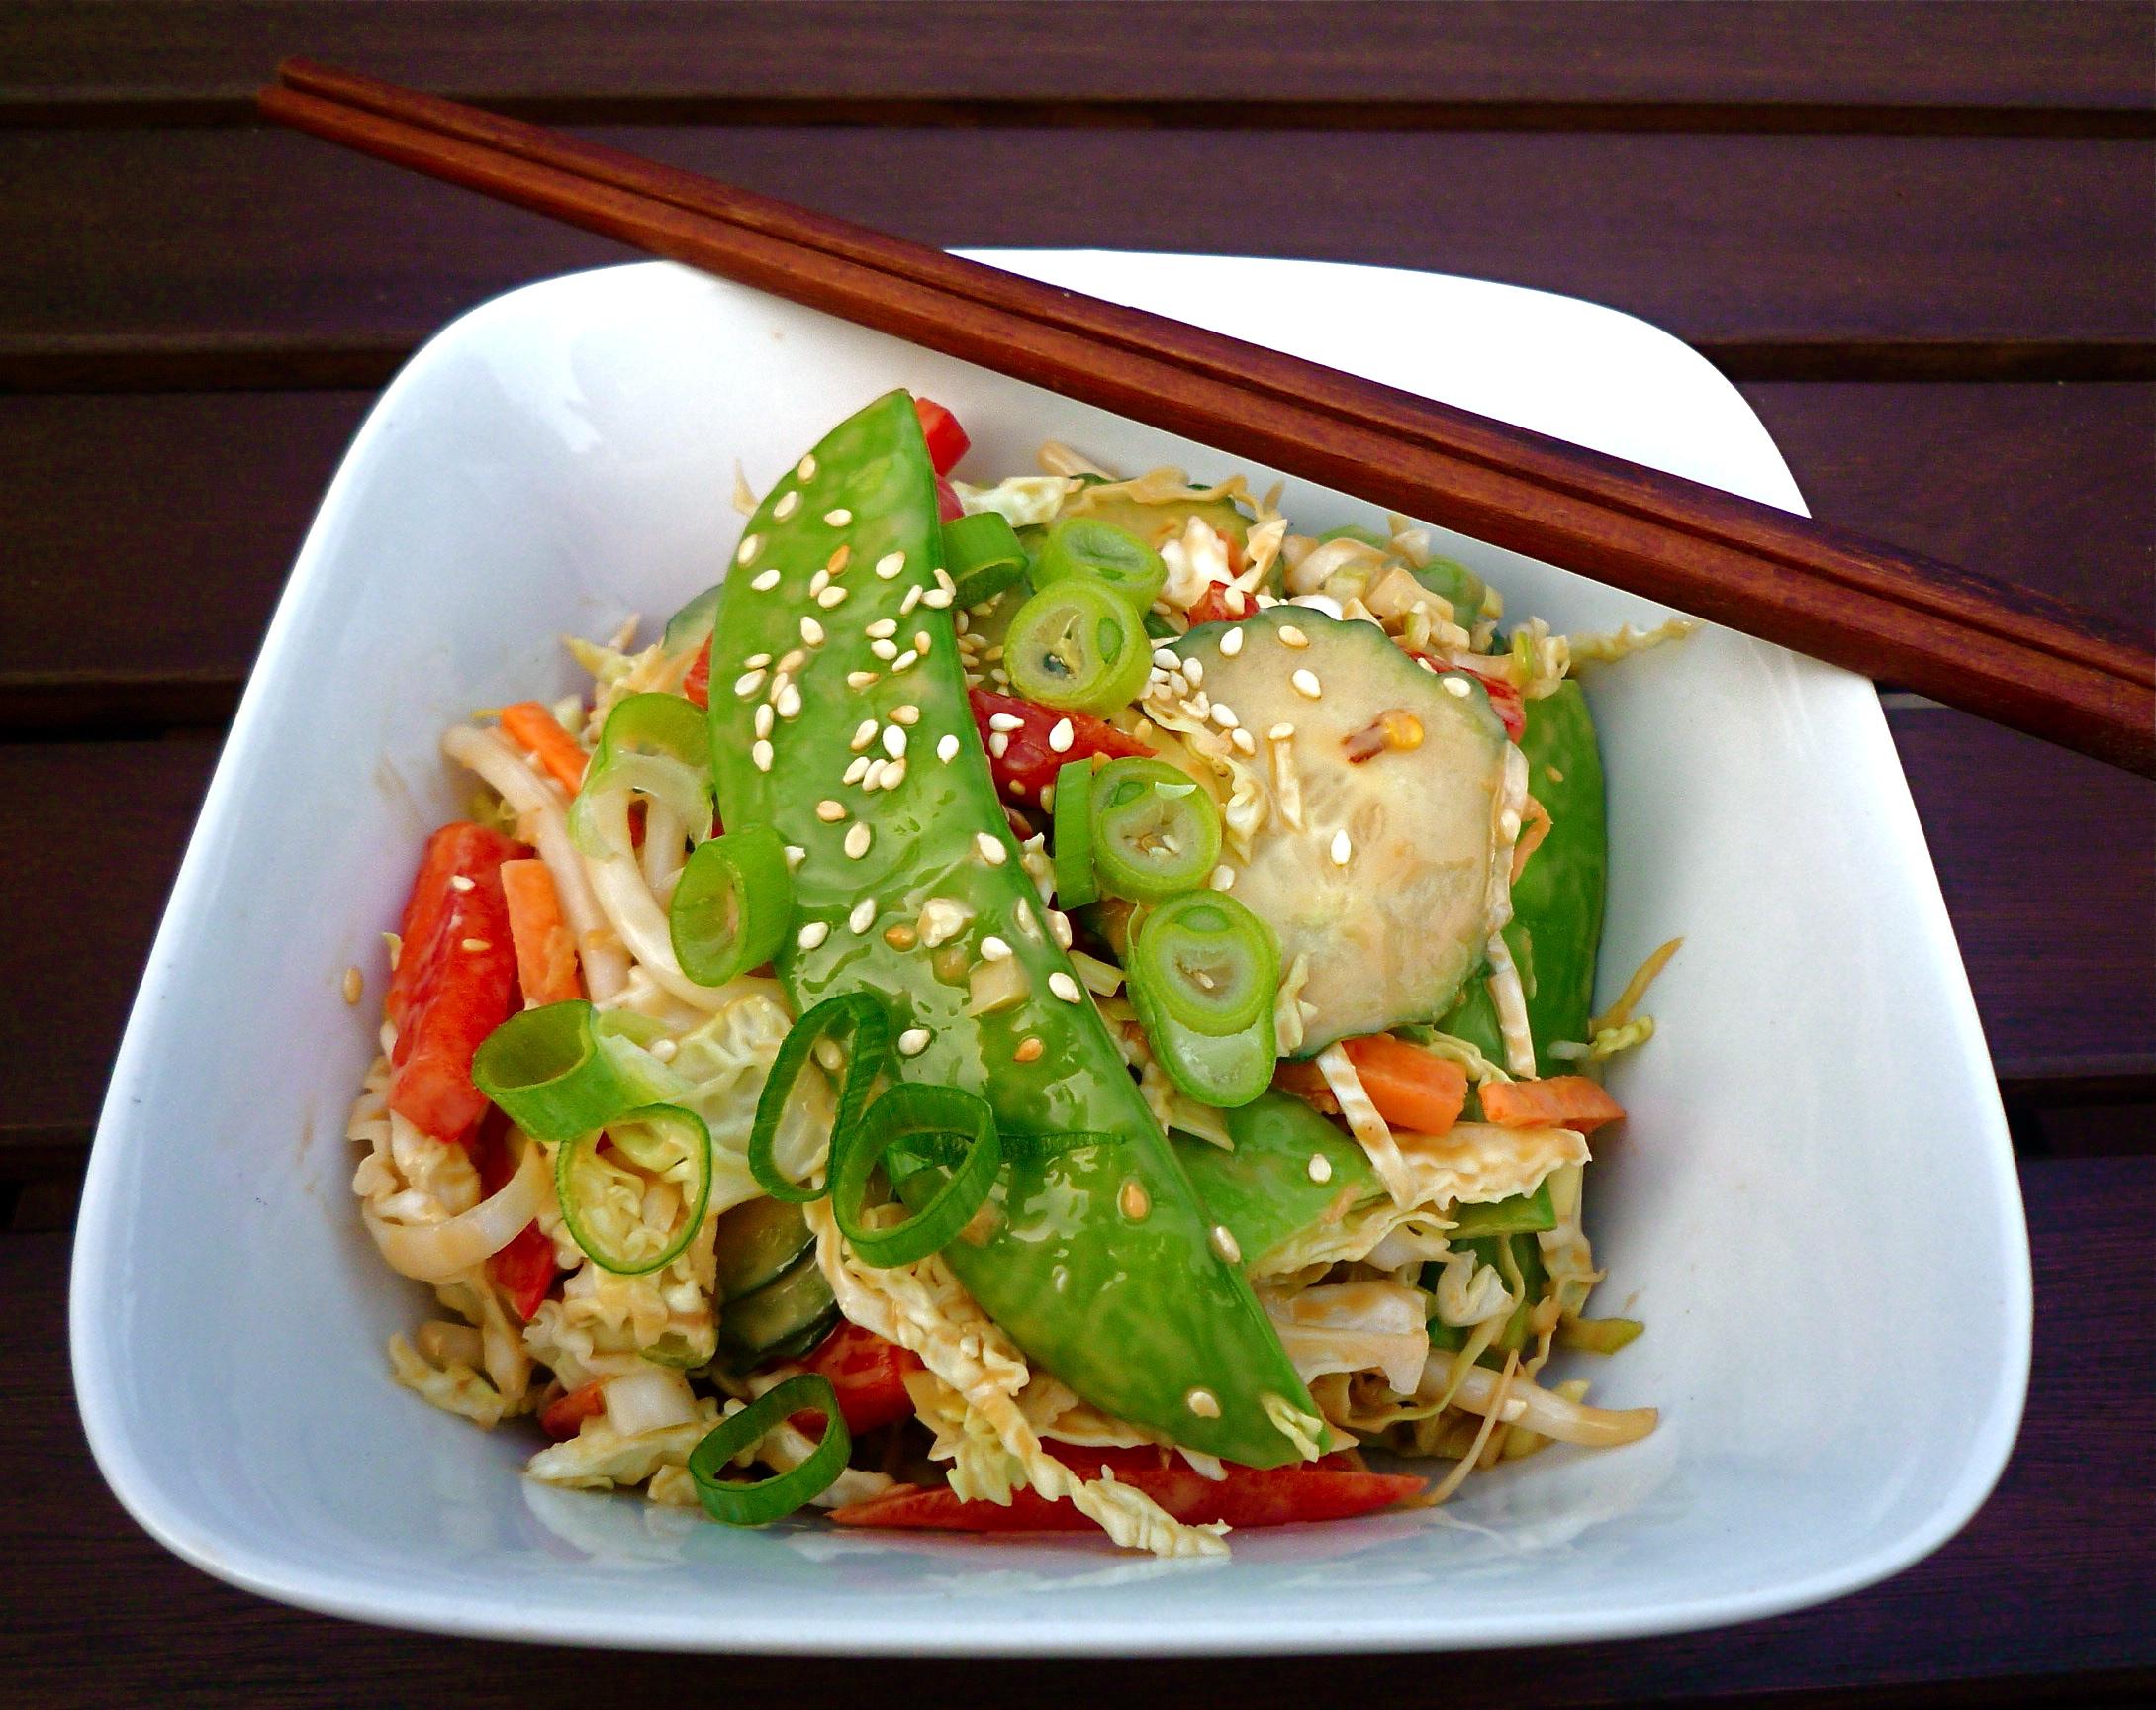 ... salad with apples summer house lobster salad heat wave summer salad